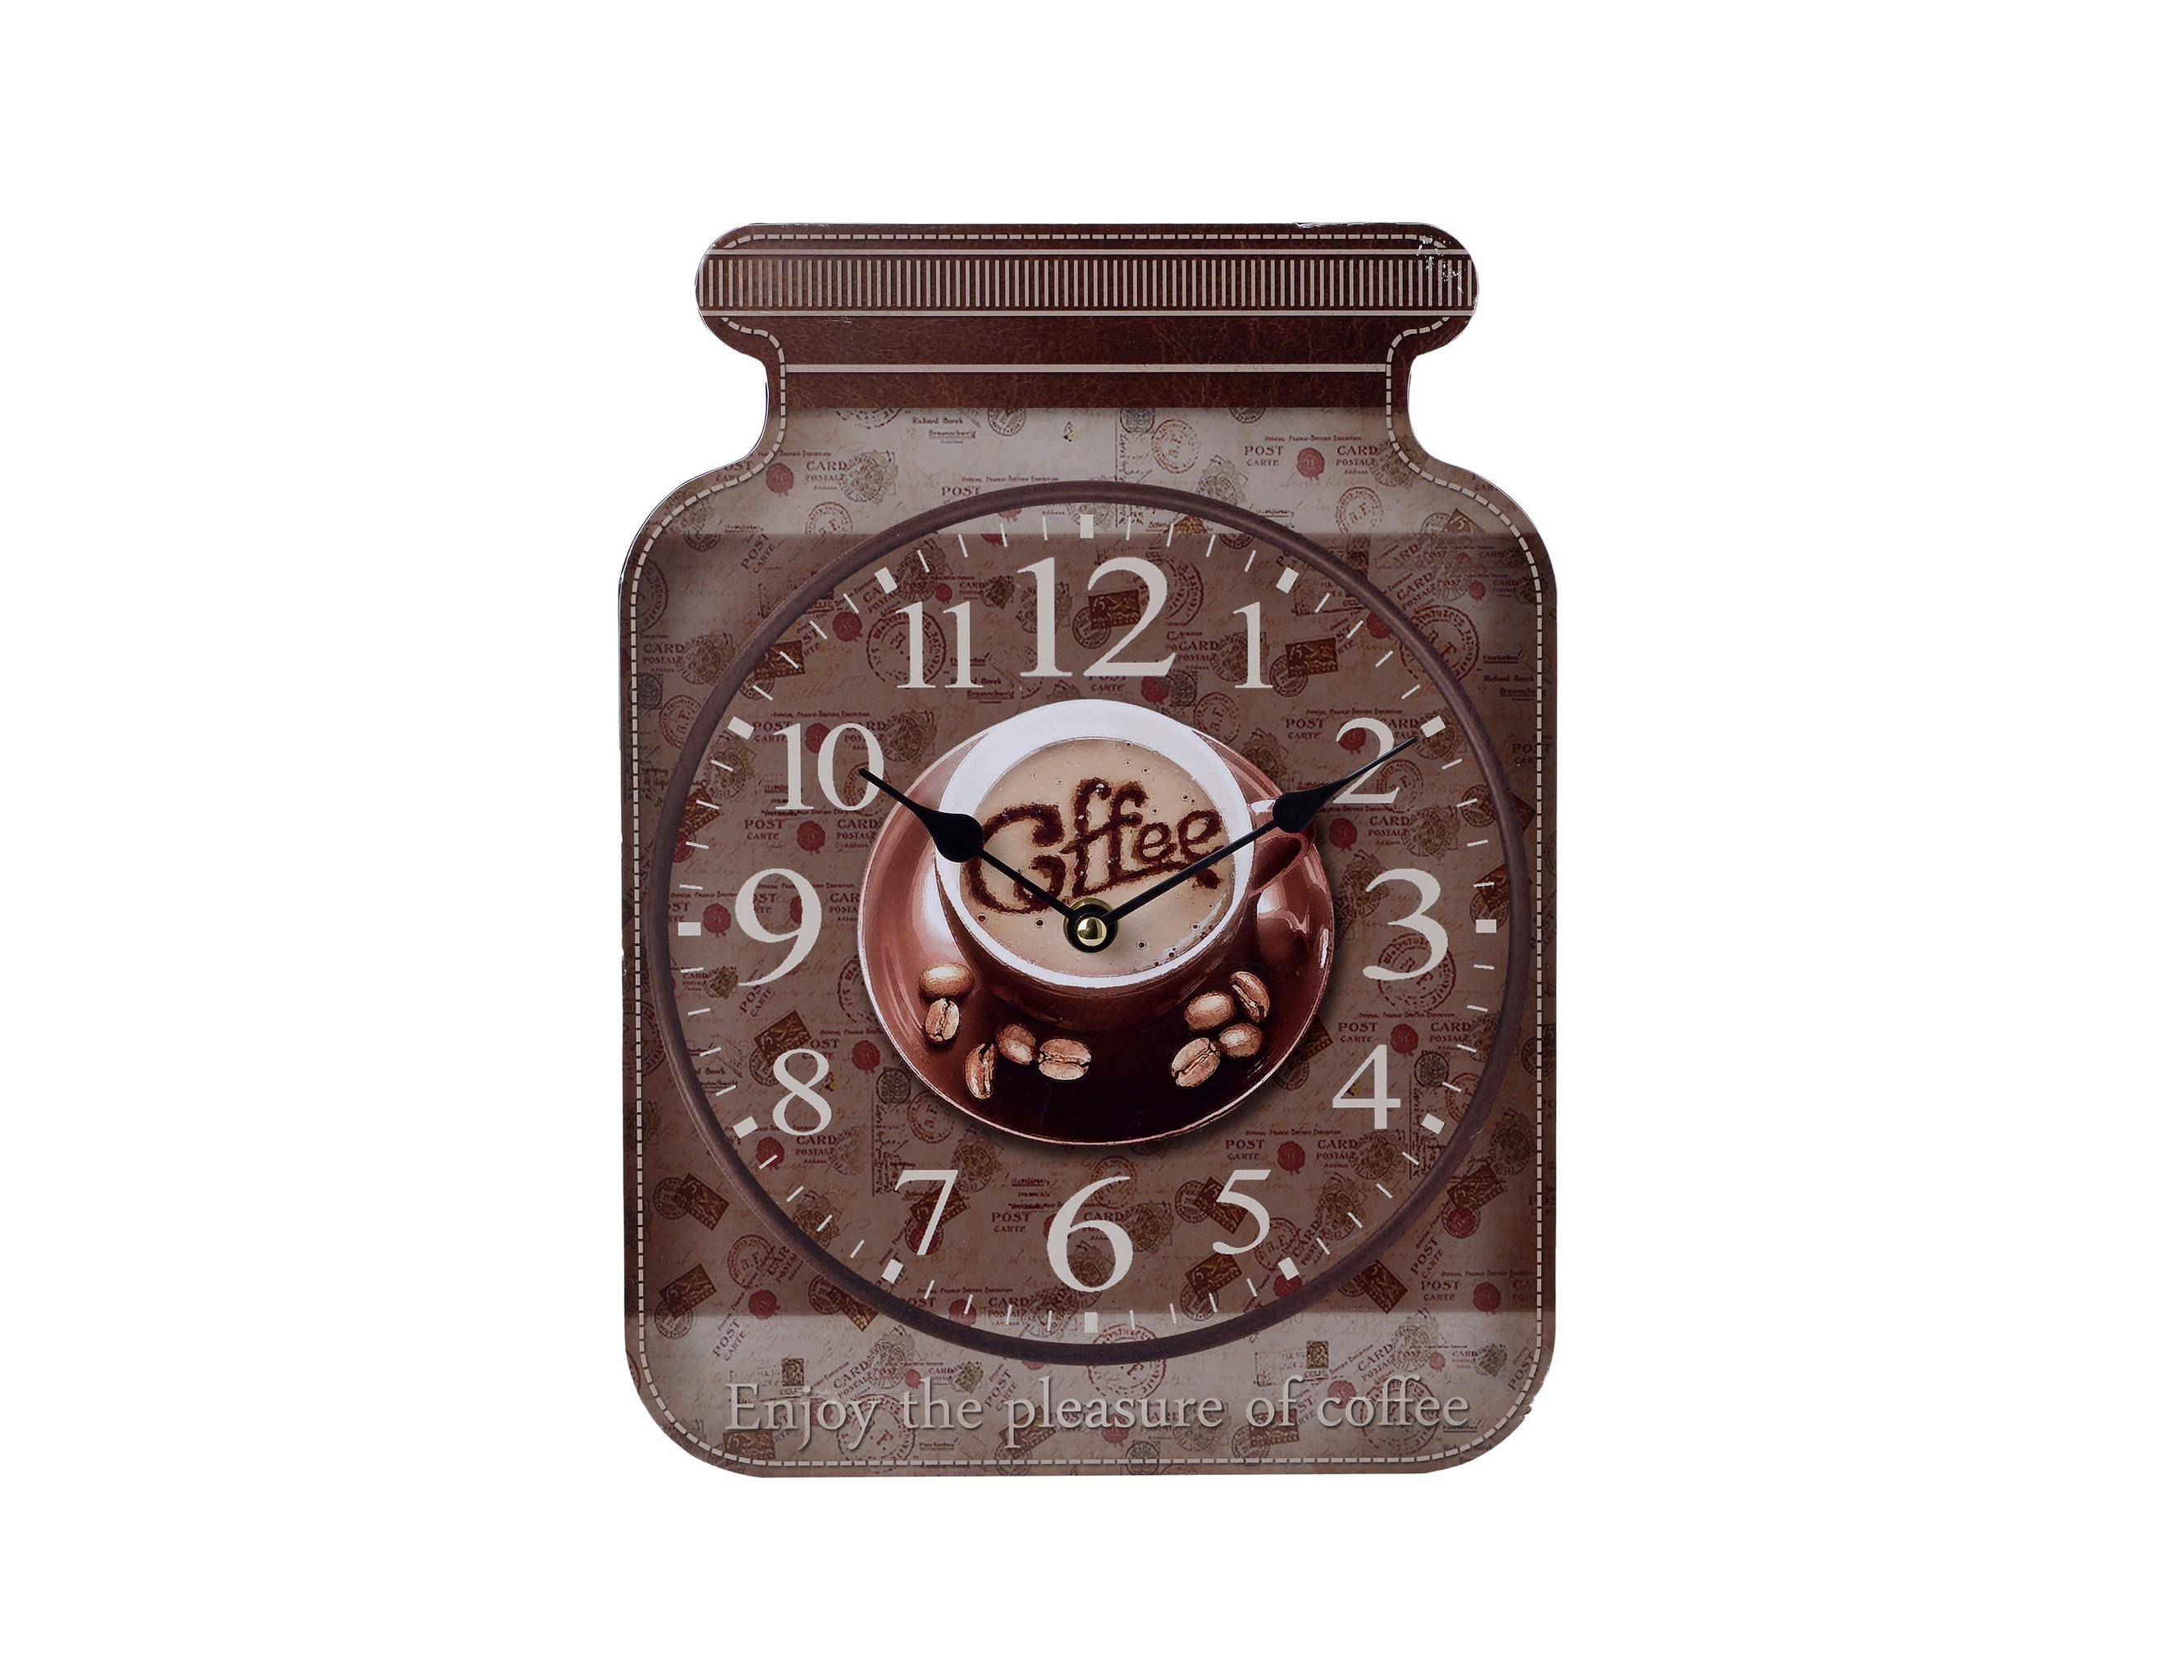 Часы настенные Definio AlfaНастенные часы<br>Механизм: кварцевый<br><br>Material: МДФ<br>Ширина см: 23.0<br>Высота см: 31.0<br>Глубина см: 4.0